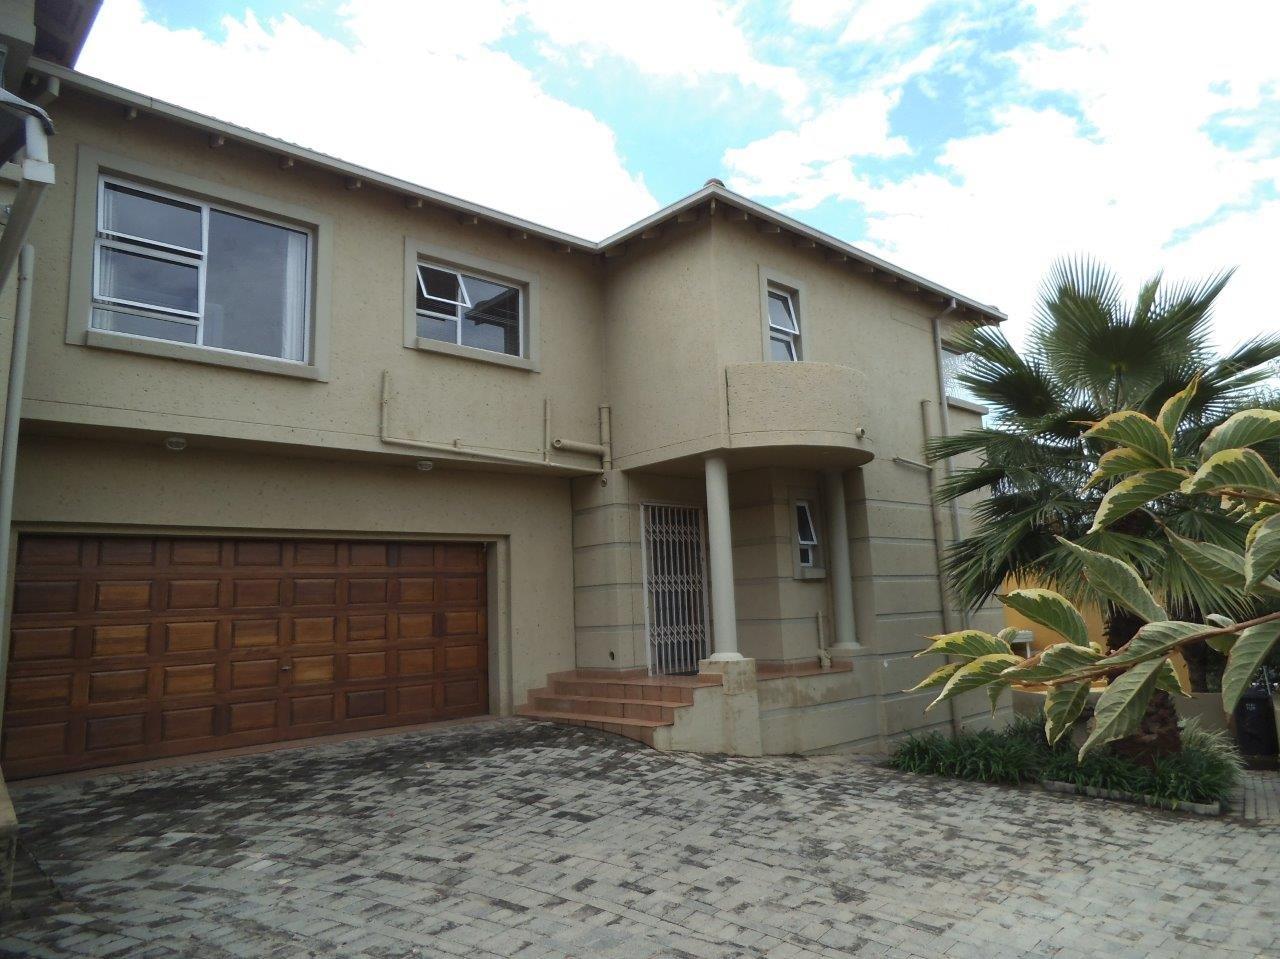 Johannesburg, Glenvista Property  | Houses For Sale Glenvista - Page 2, Glenvista, Townhouse 3 bedrooms property for sale Price:2,280,000